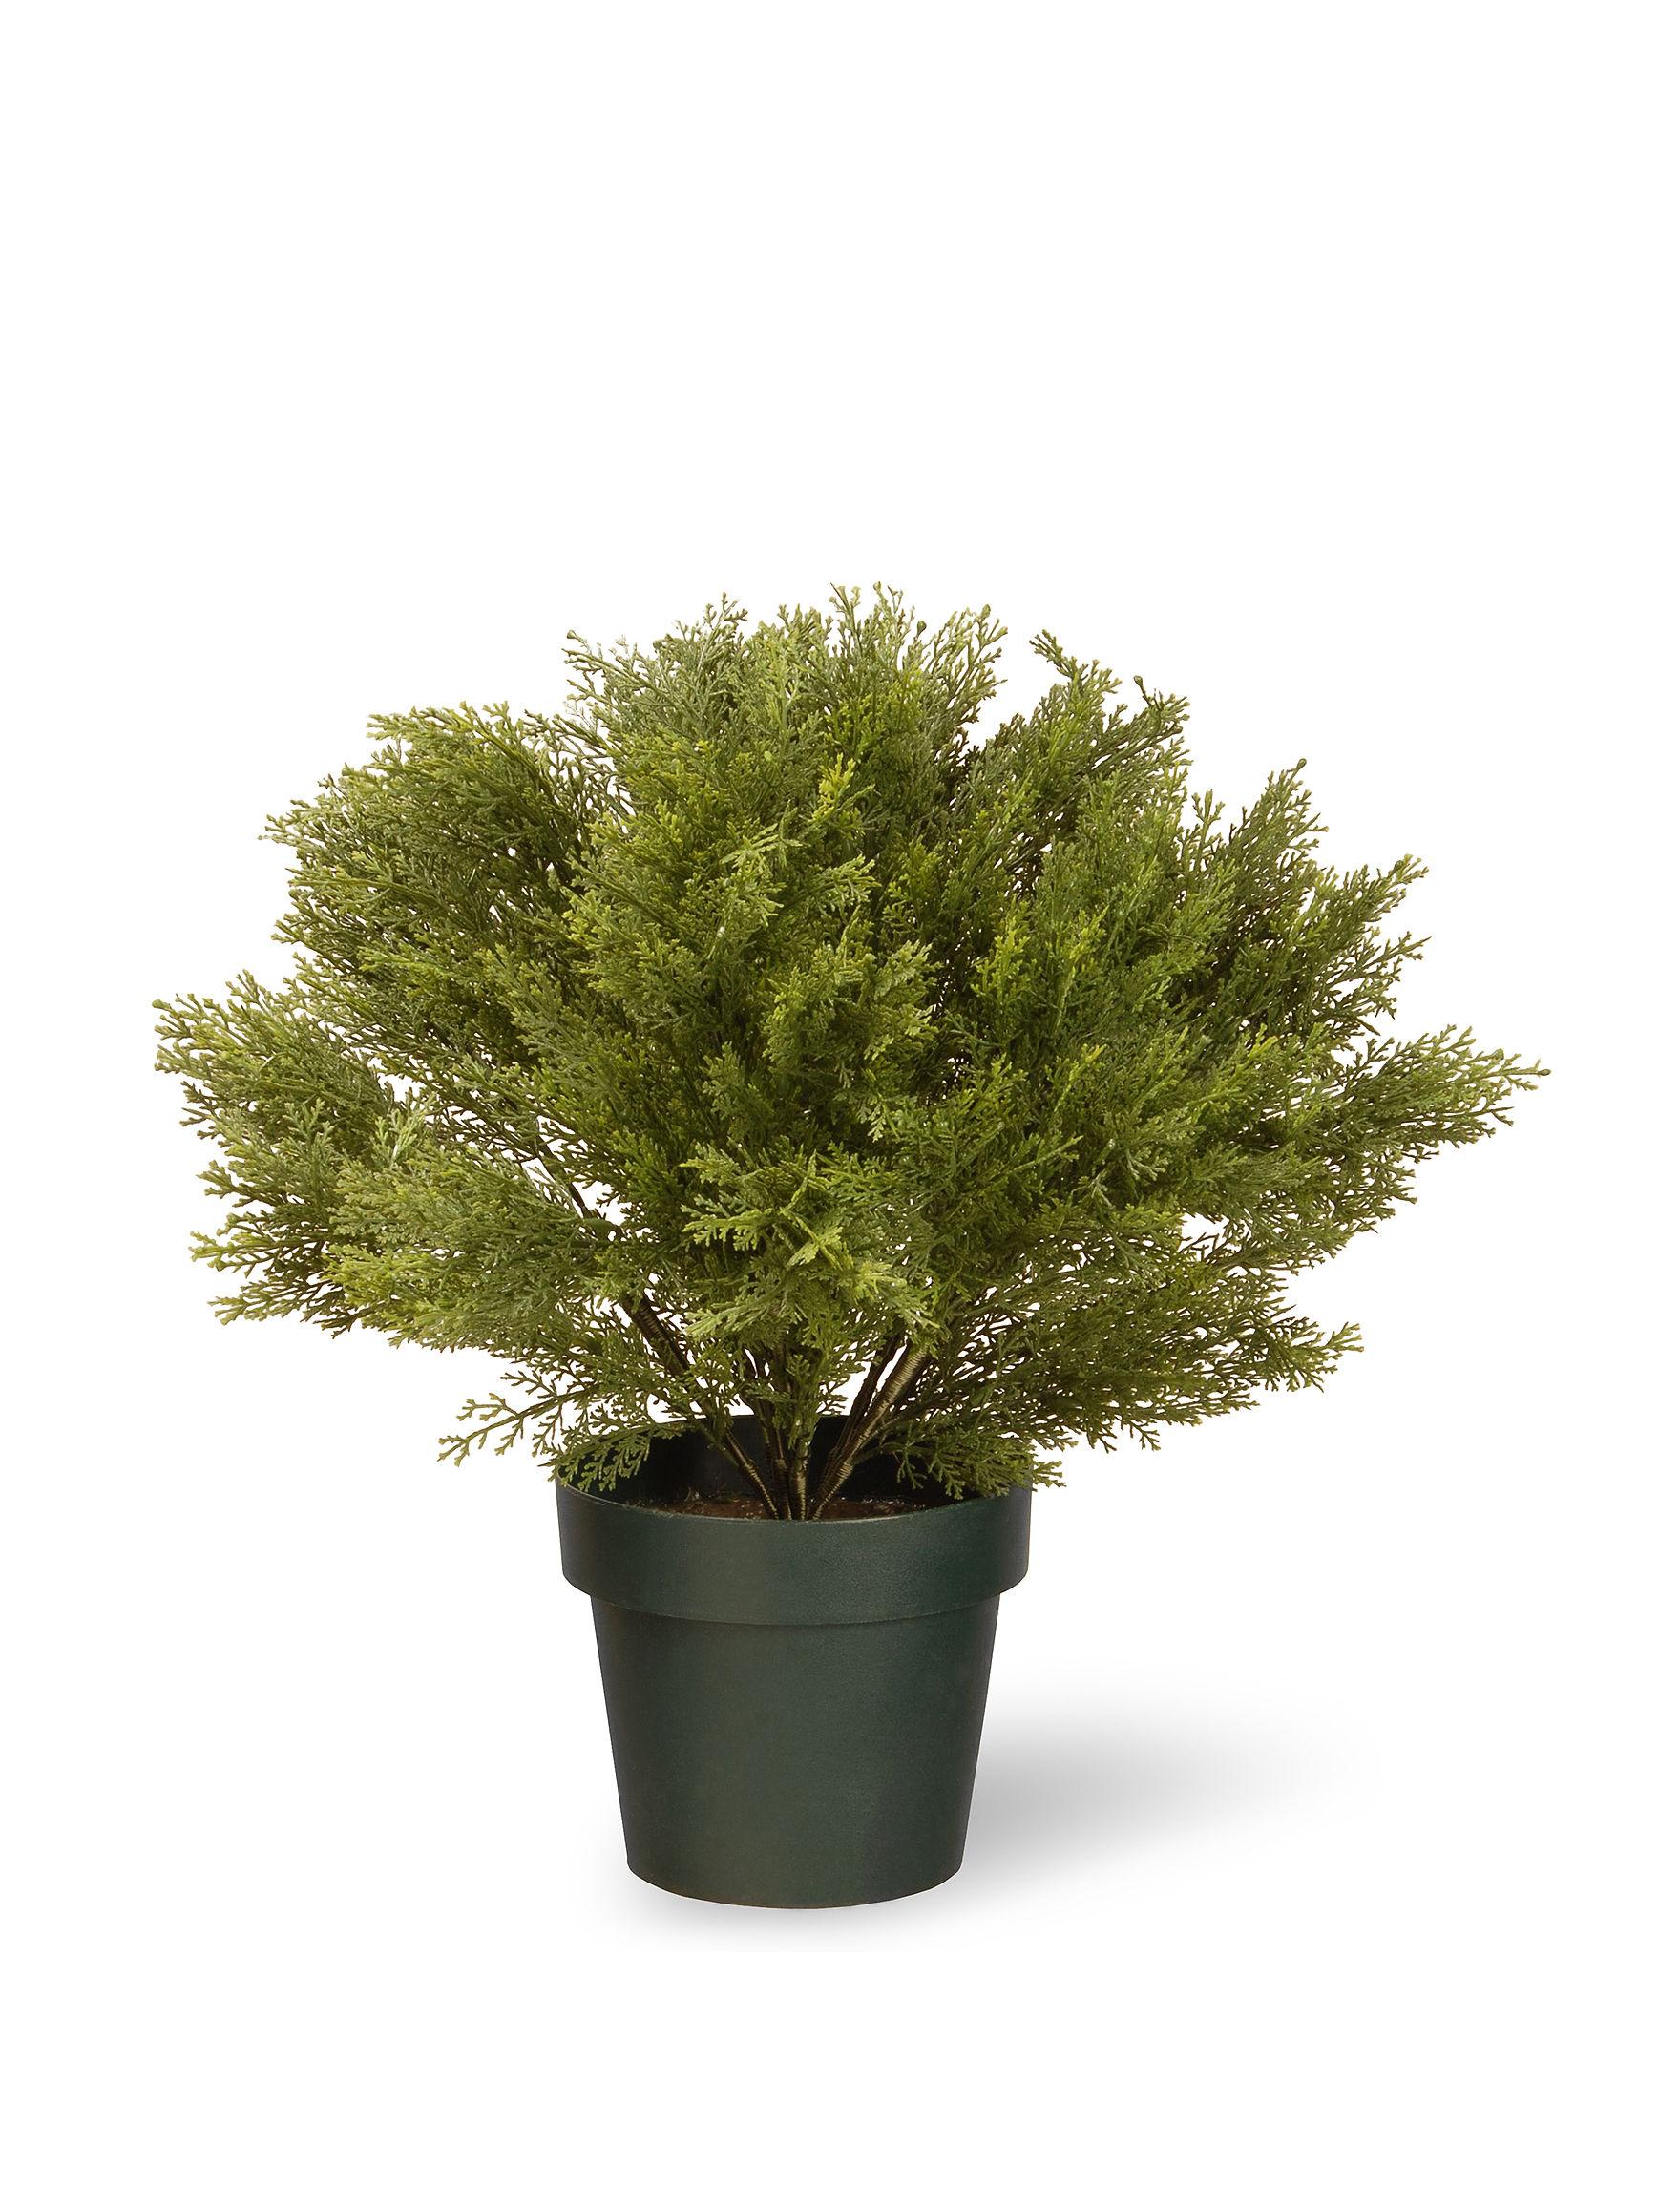 National Tree Company Green Faux Plants Planters & Garden Decor Outdoor Decor